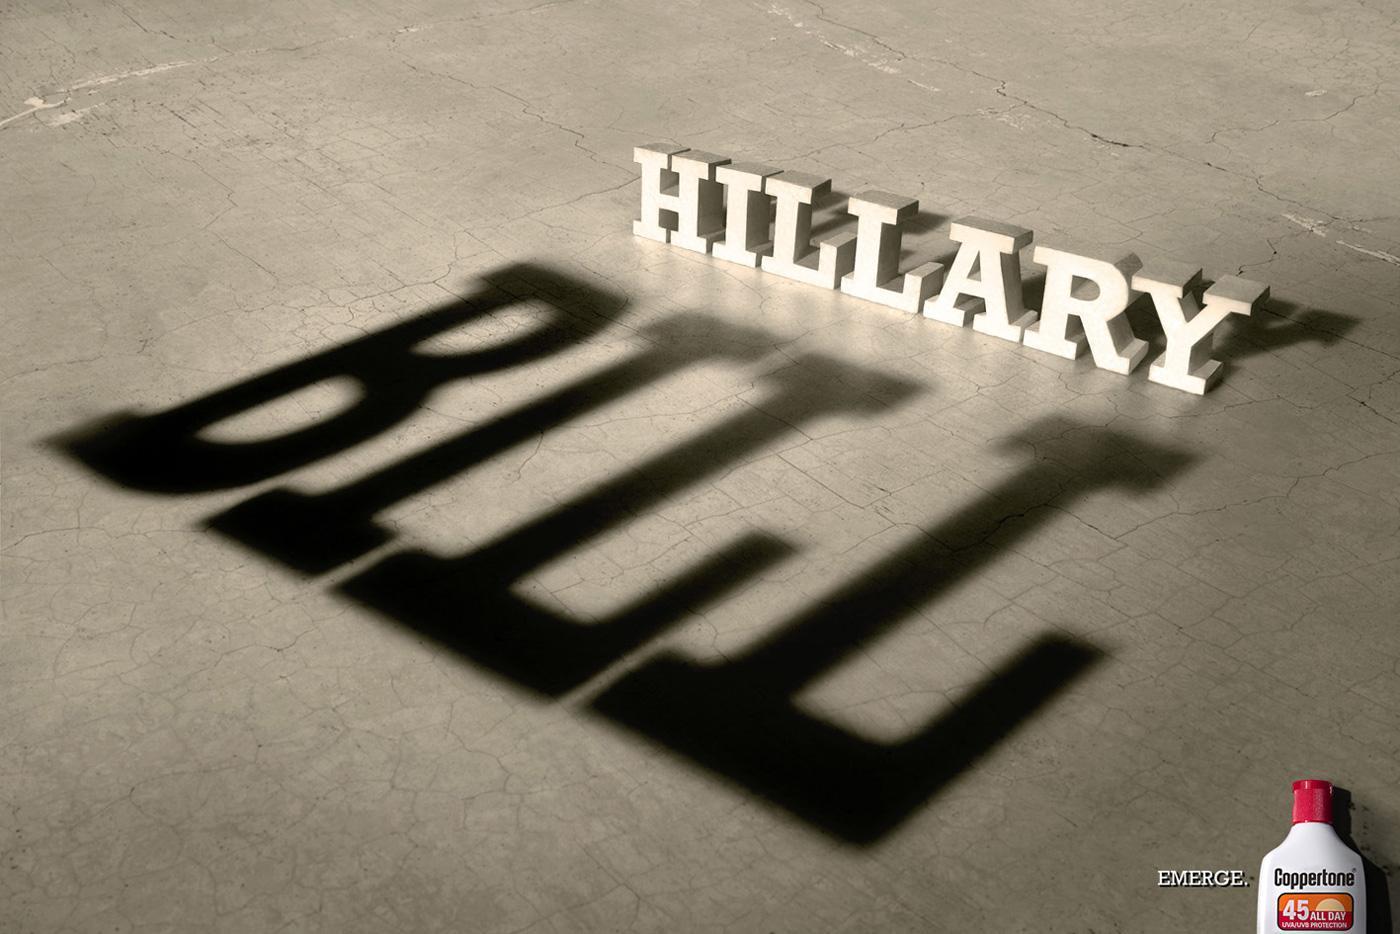 Coppertone Print Ad -  Hillary